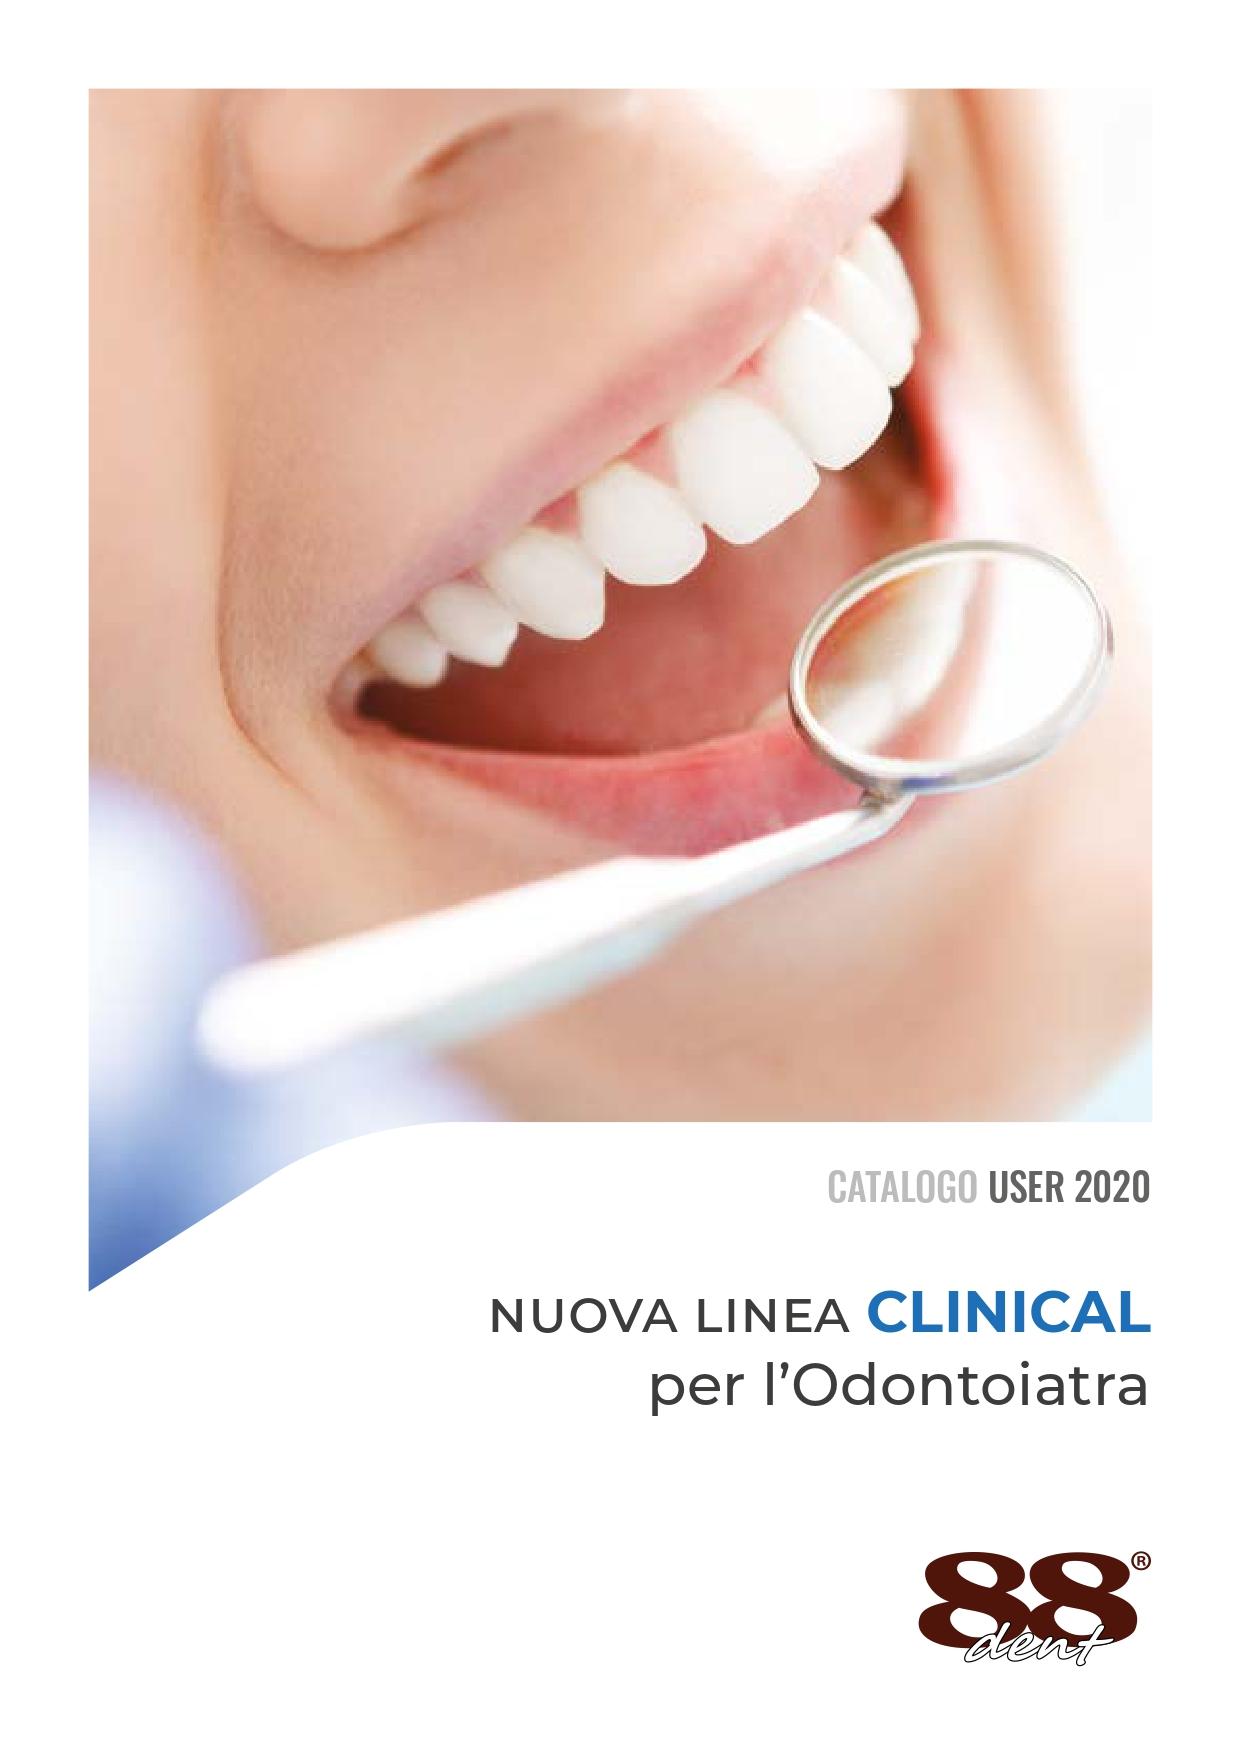 Catalogo_Clinical_User_ITA_09.2020 (4)-1_page-0001